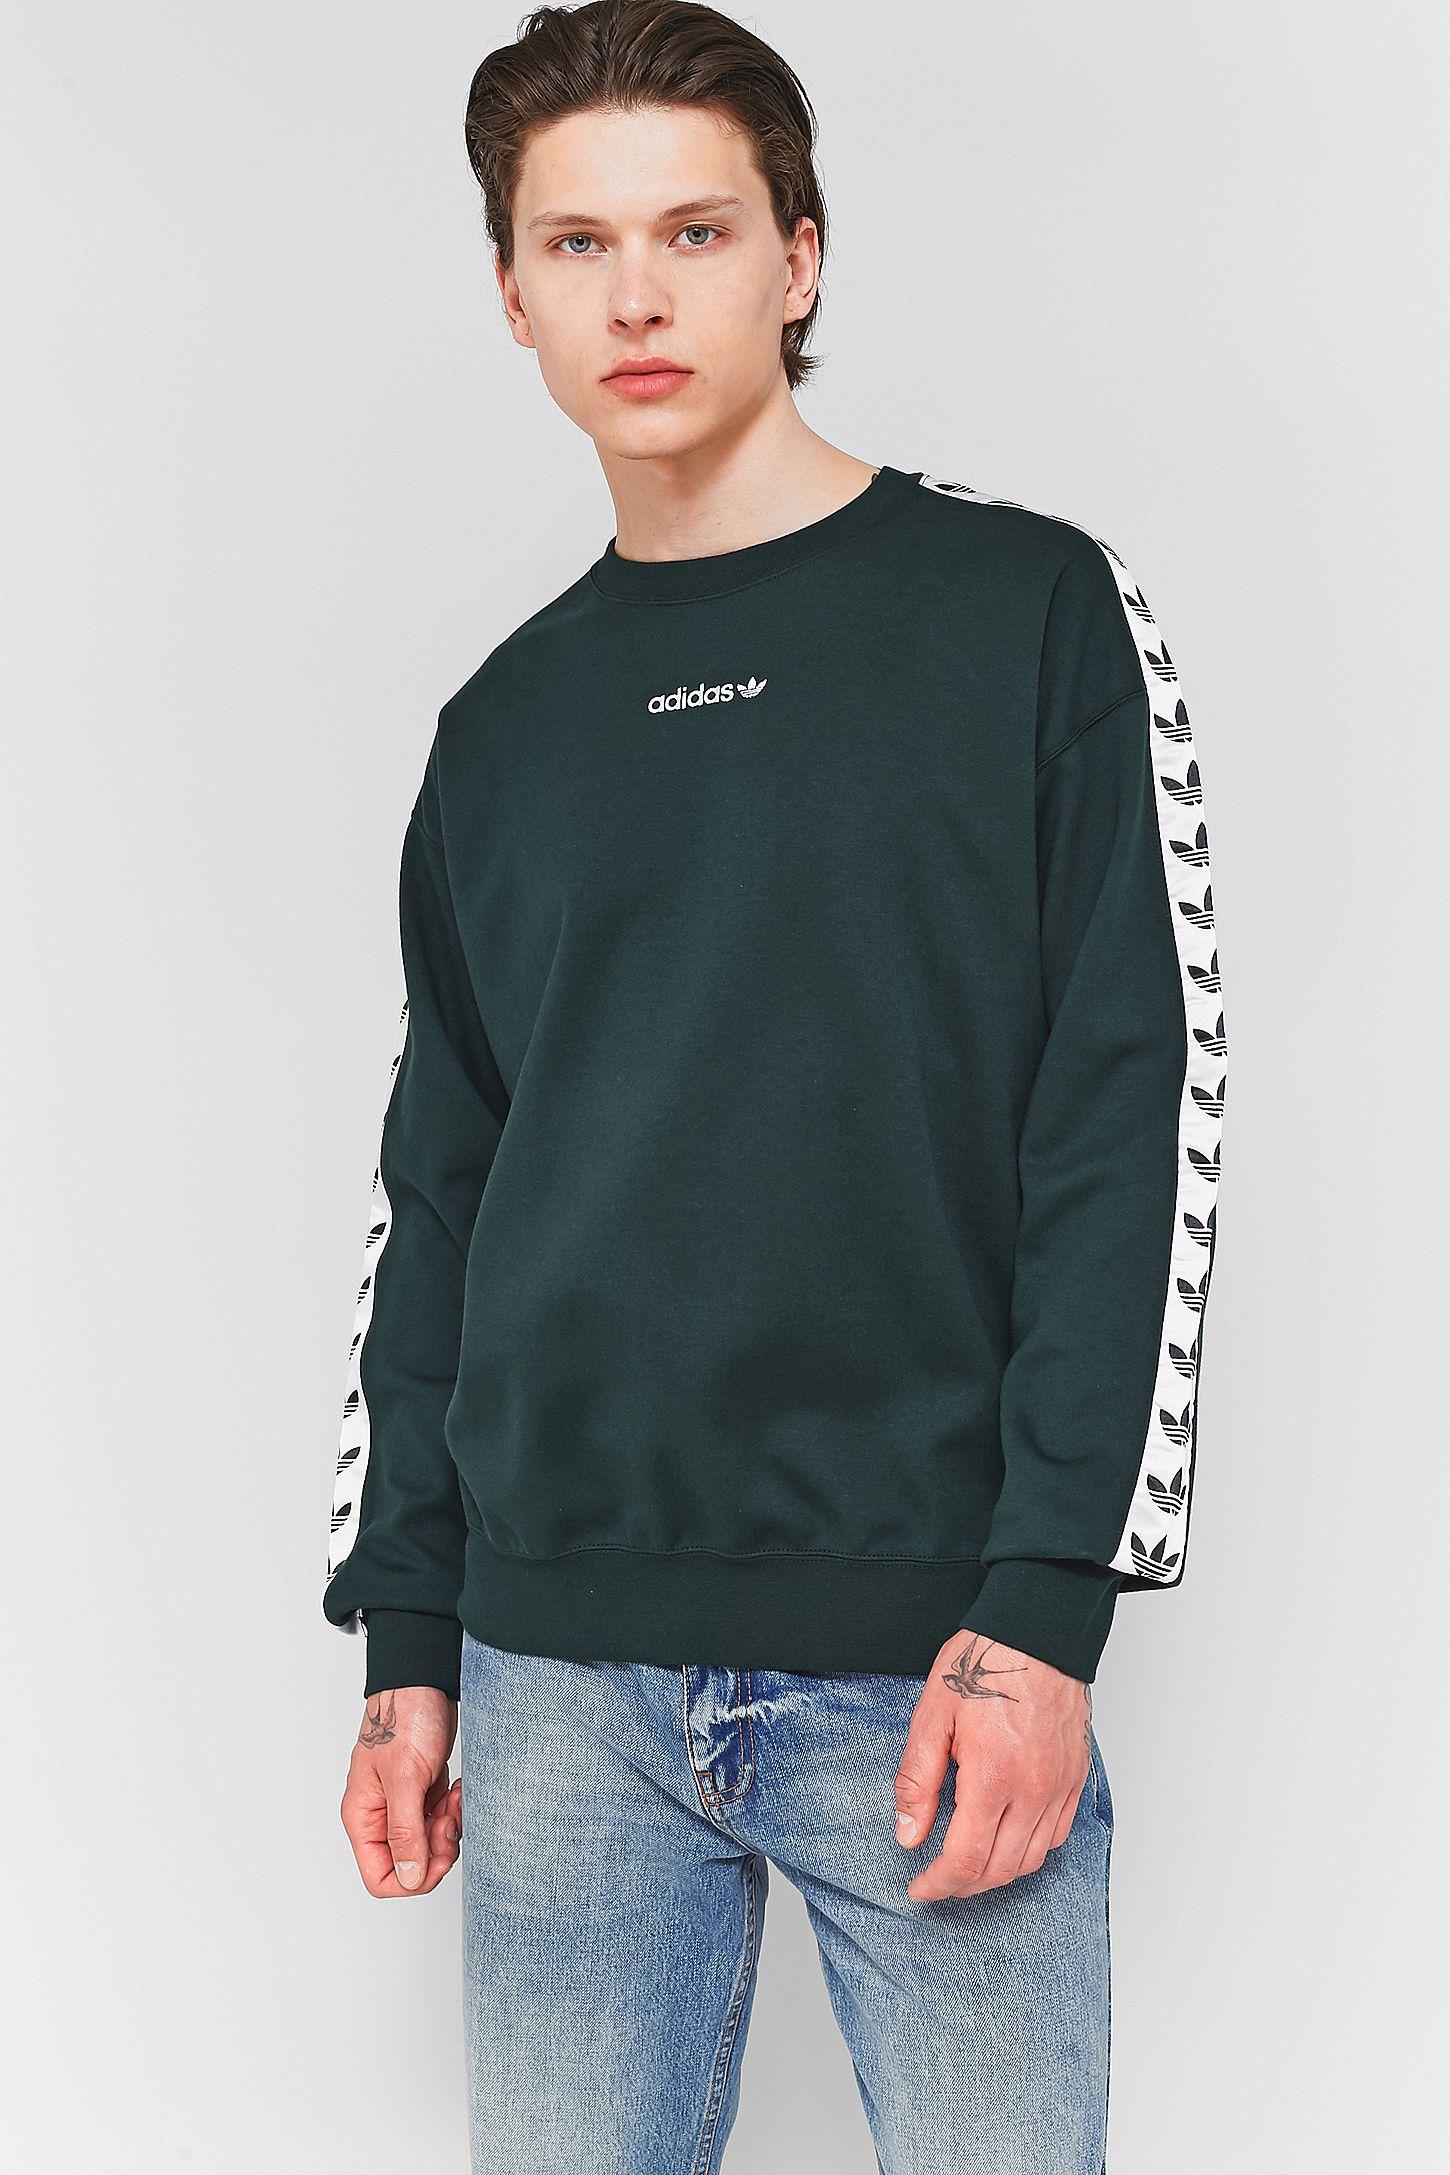 Fr Taped Sweatshirt Adidas Urban Night Tnt Outfitters Crewneck Green HqxwaATp